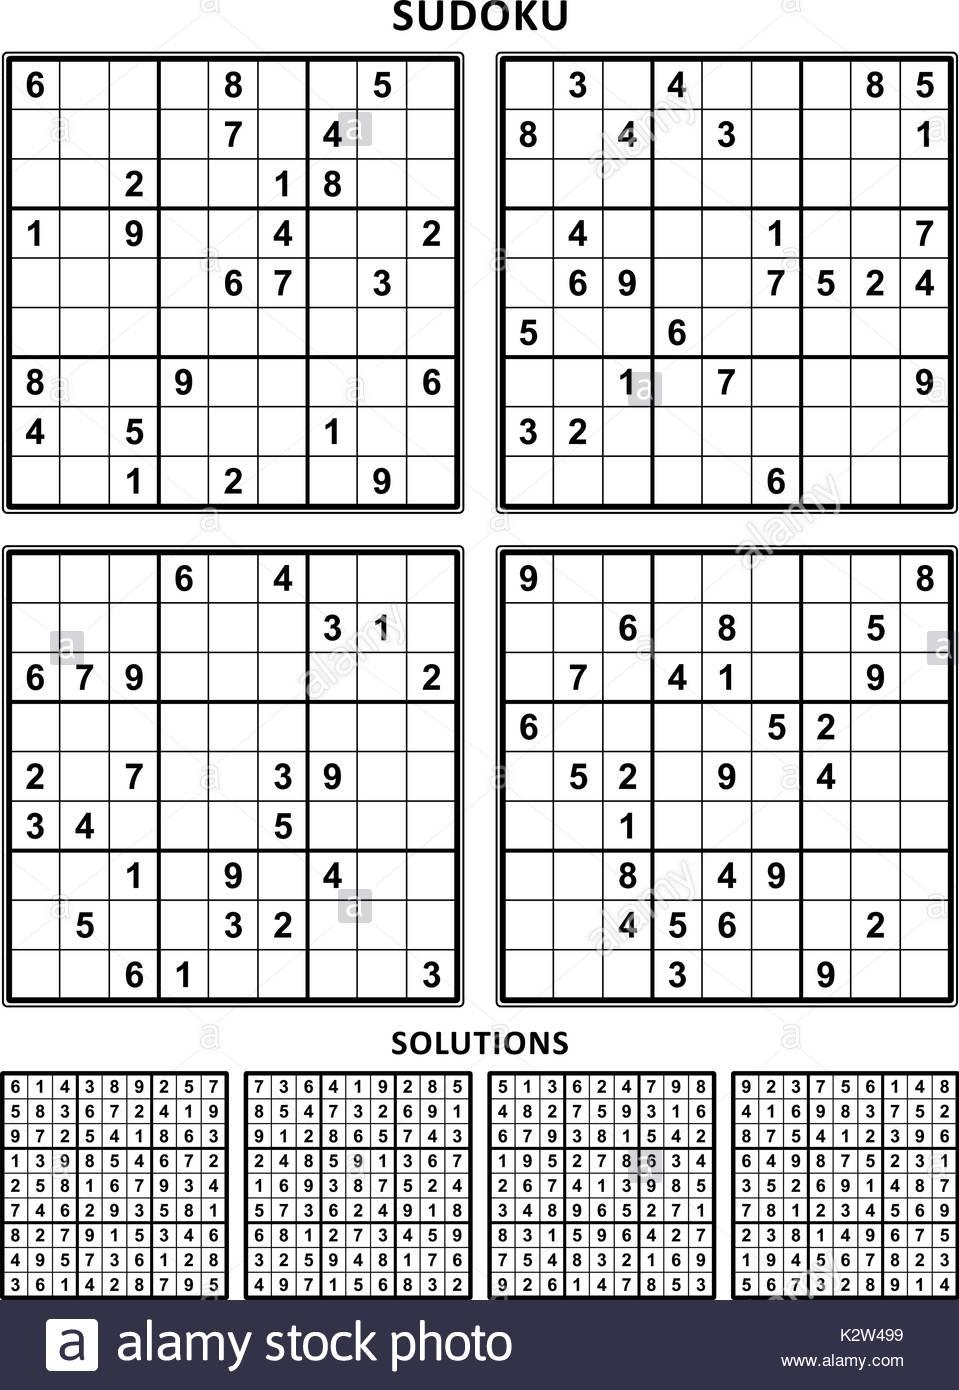 Sudoku Black And White Stock Photos & Images - Alamy